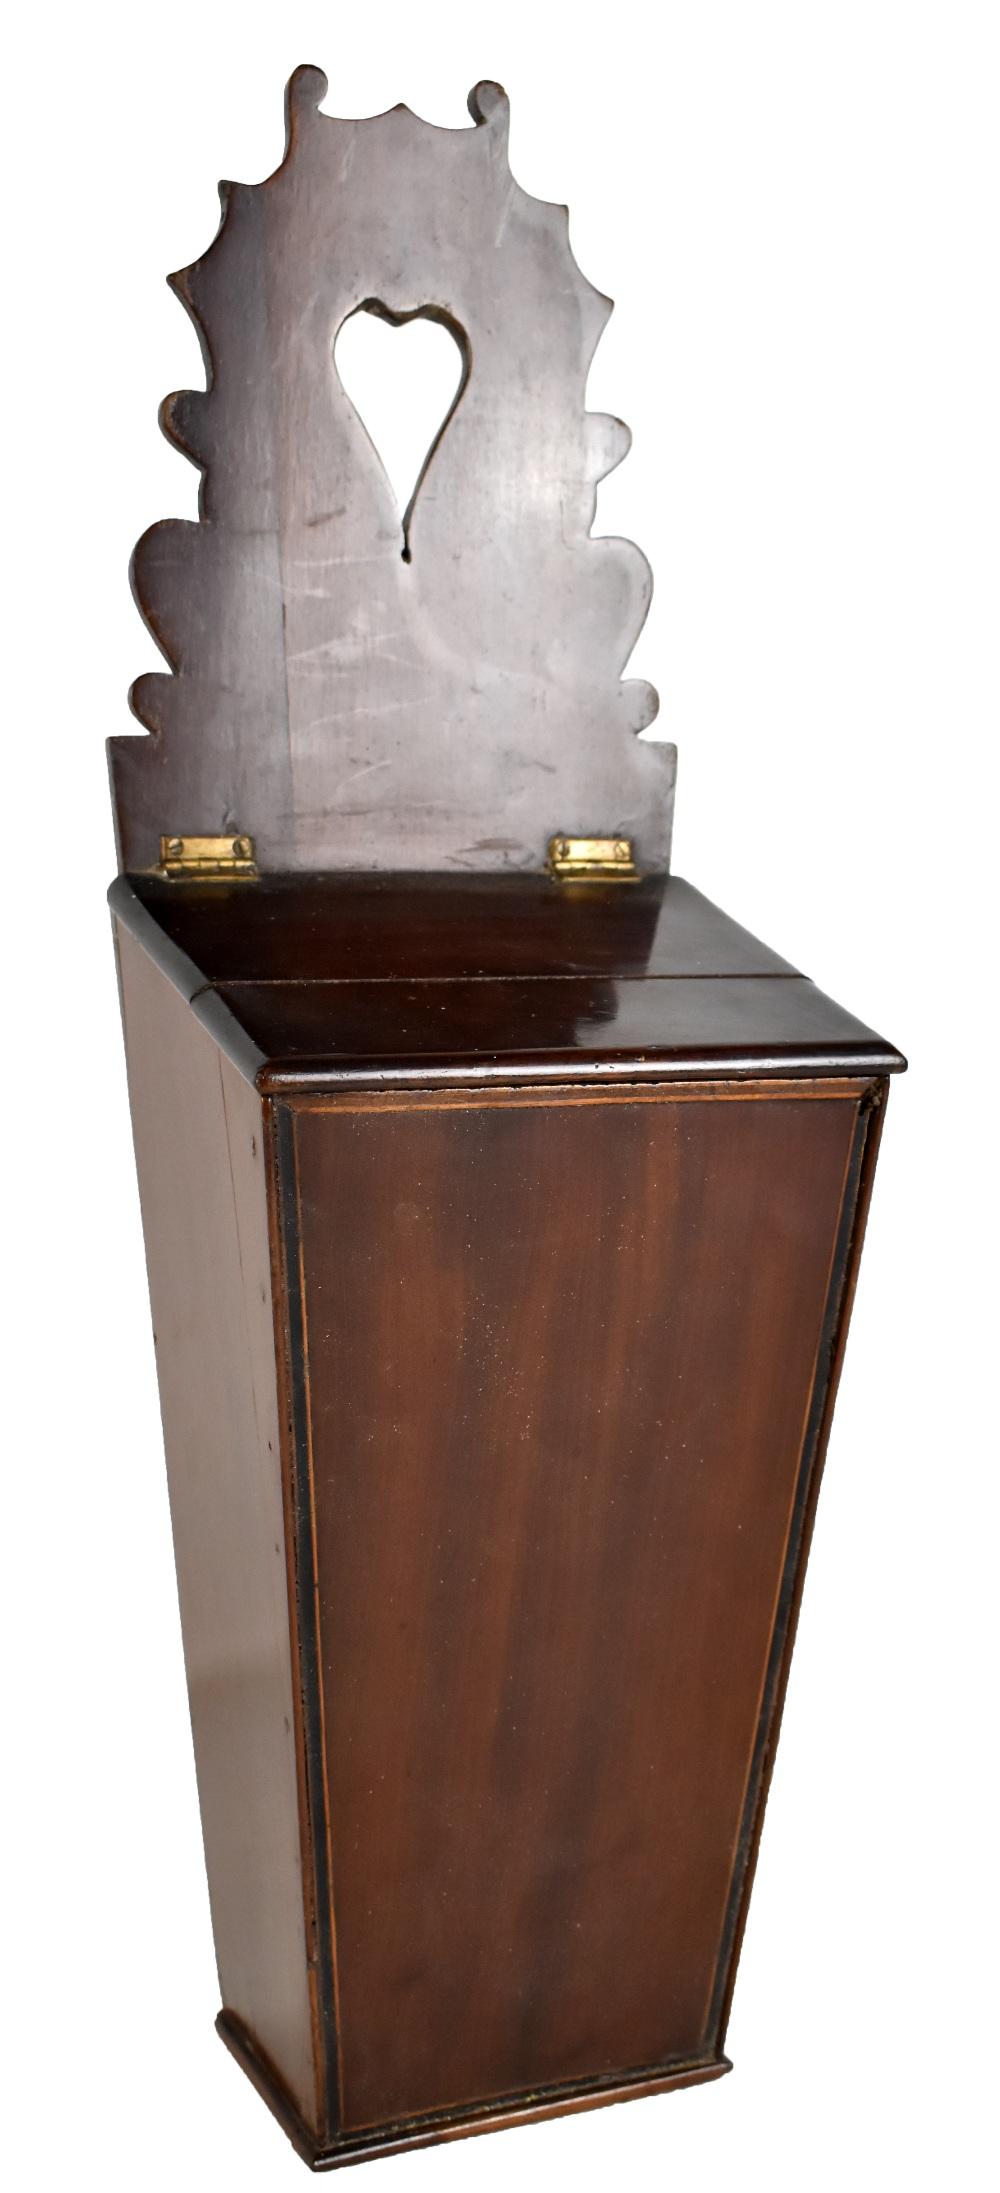 Lot 42 - A 19th century mahogany salt box, height 56cm (af).